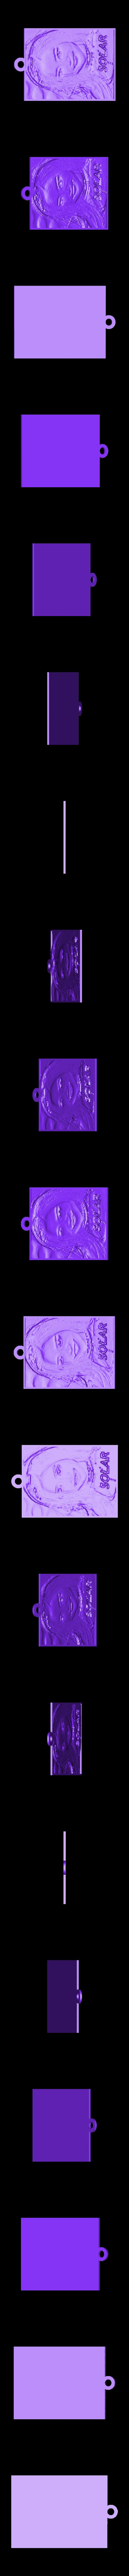 lithopane_new_20200505-48-1n78ehf.stl Download free STL file My Customized LithopaneBEE SOLAR • 3D printable object, atarka3